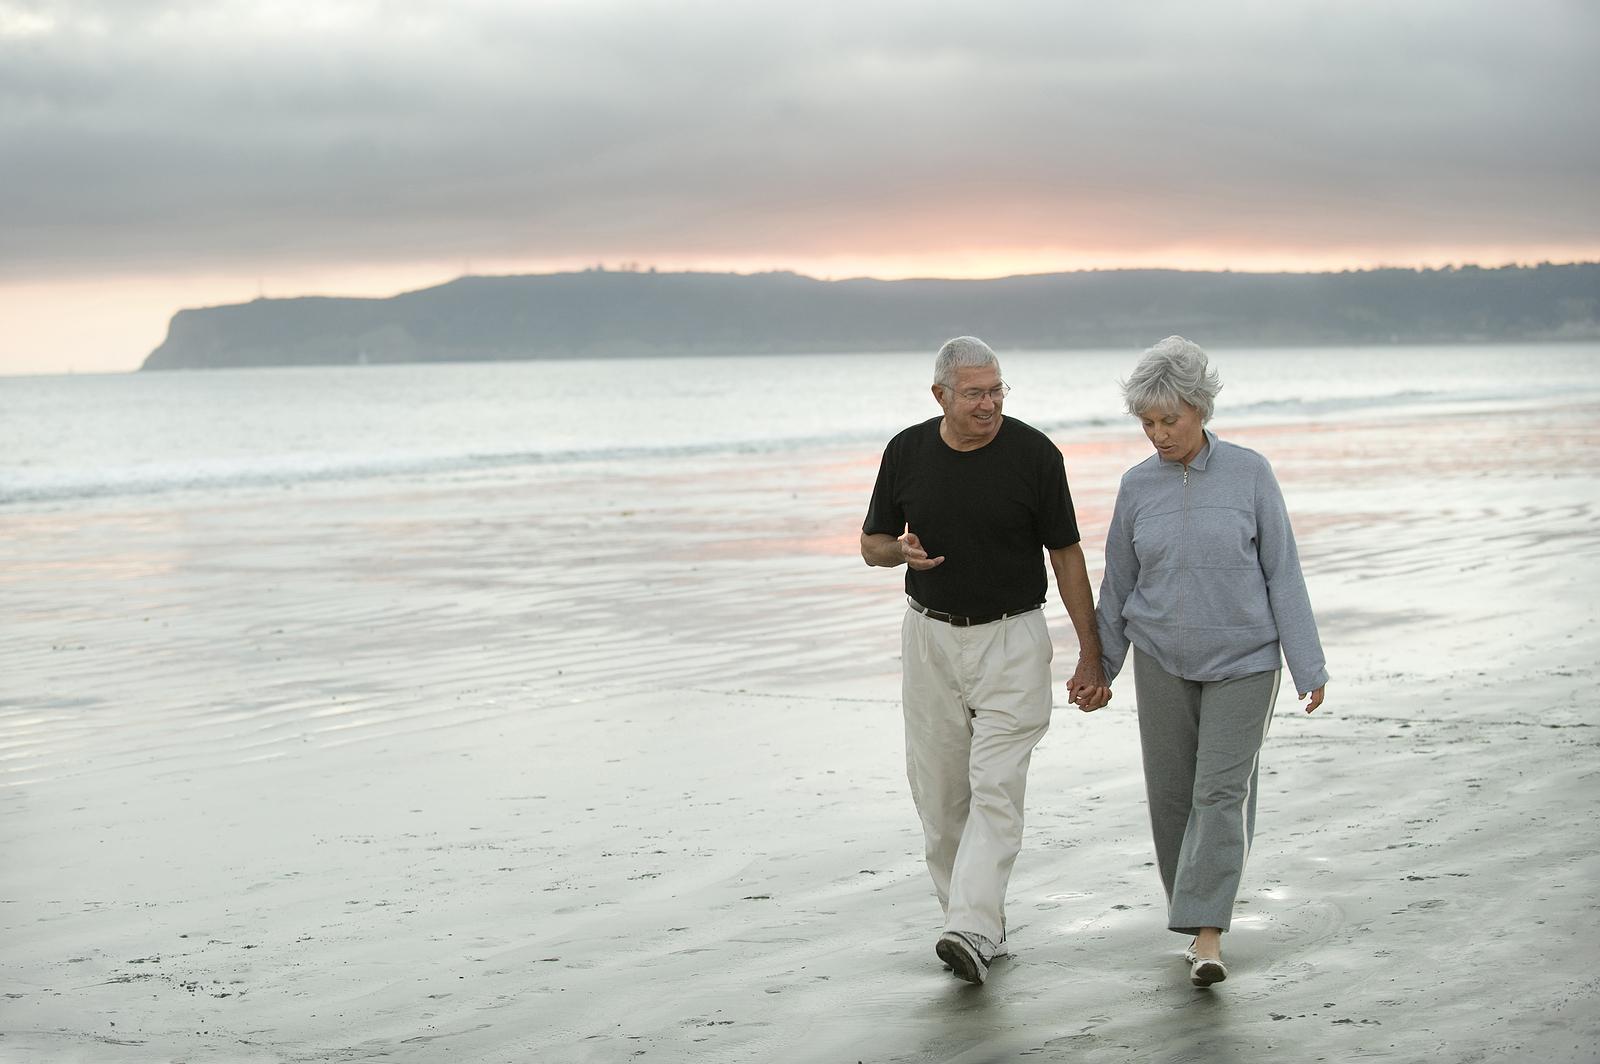 Fl Swedish Senior Online Dating Website